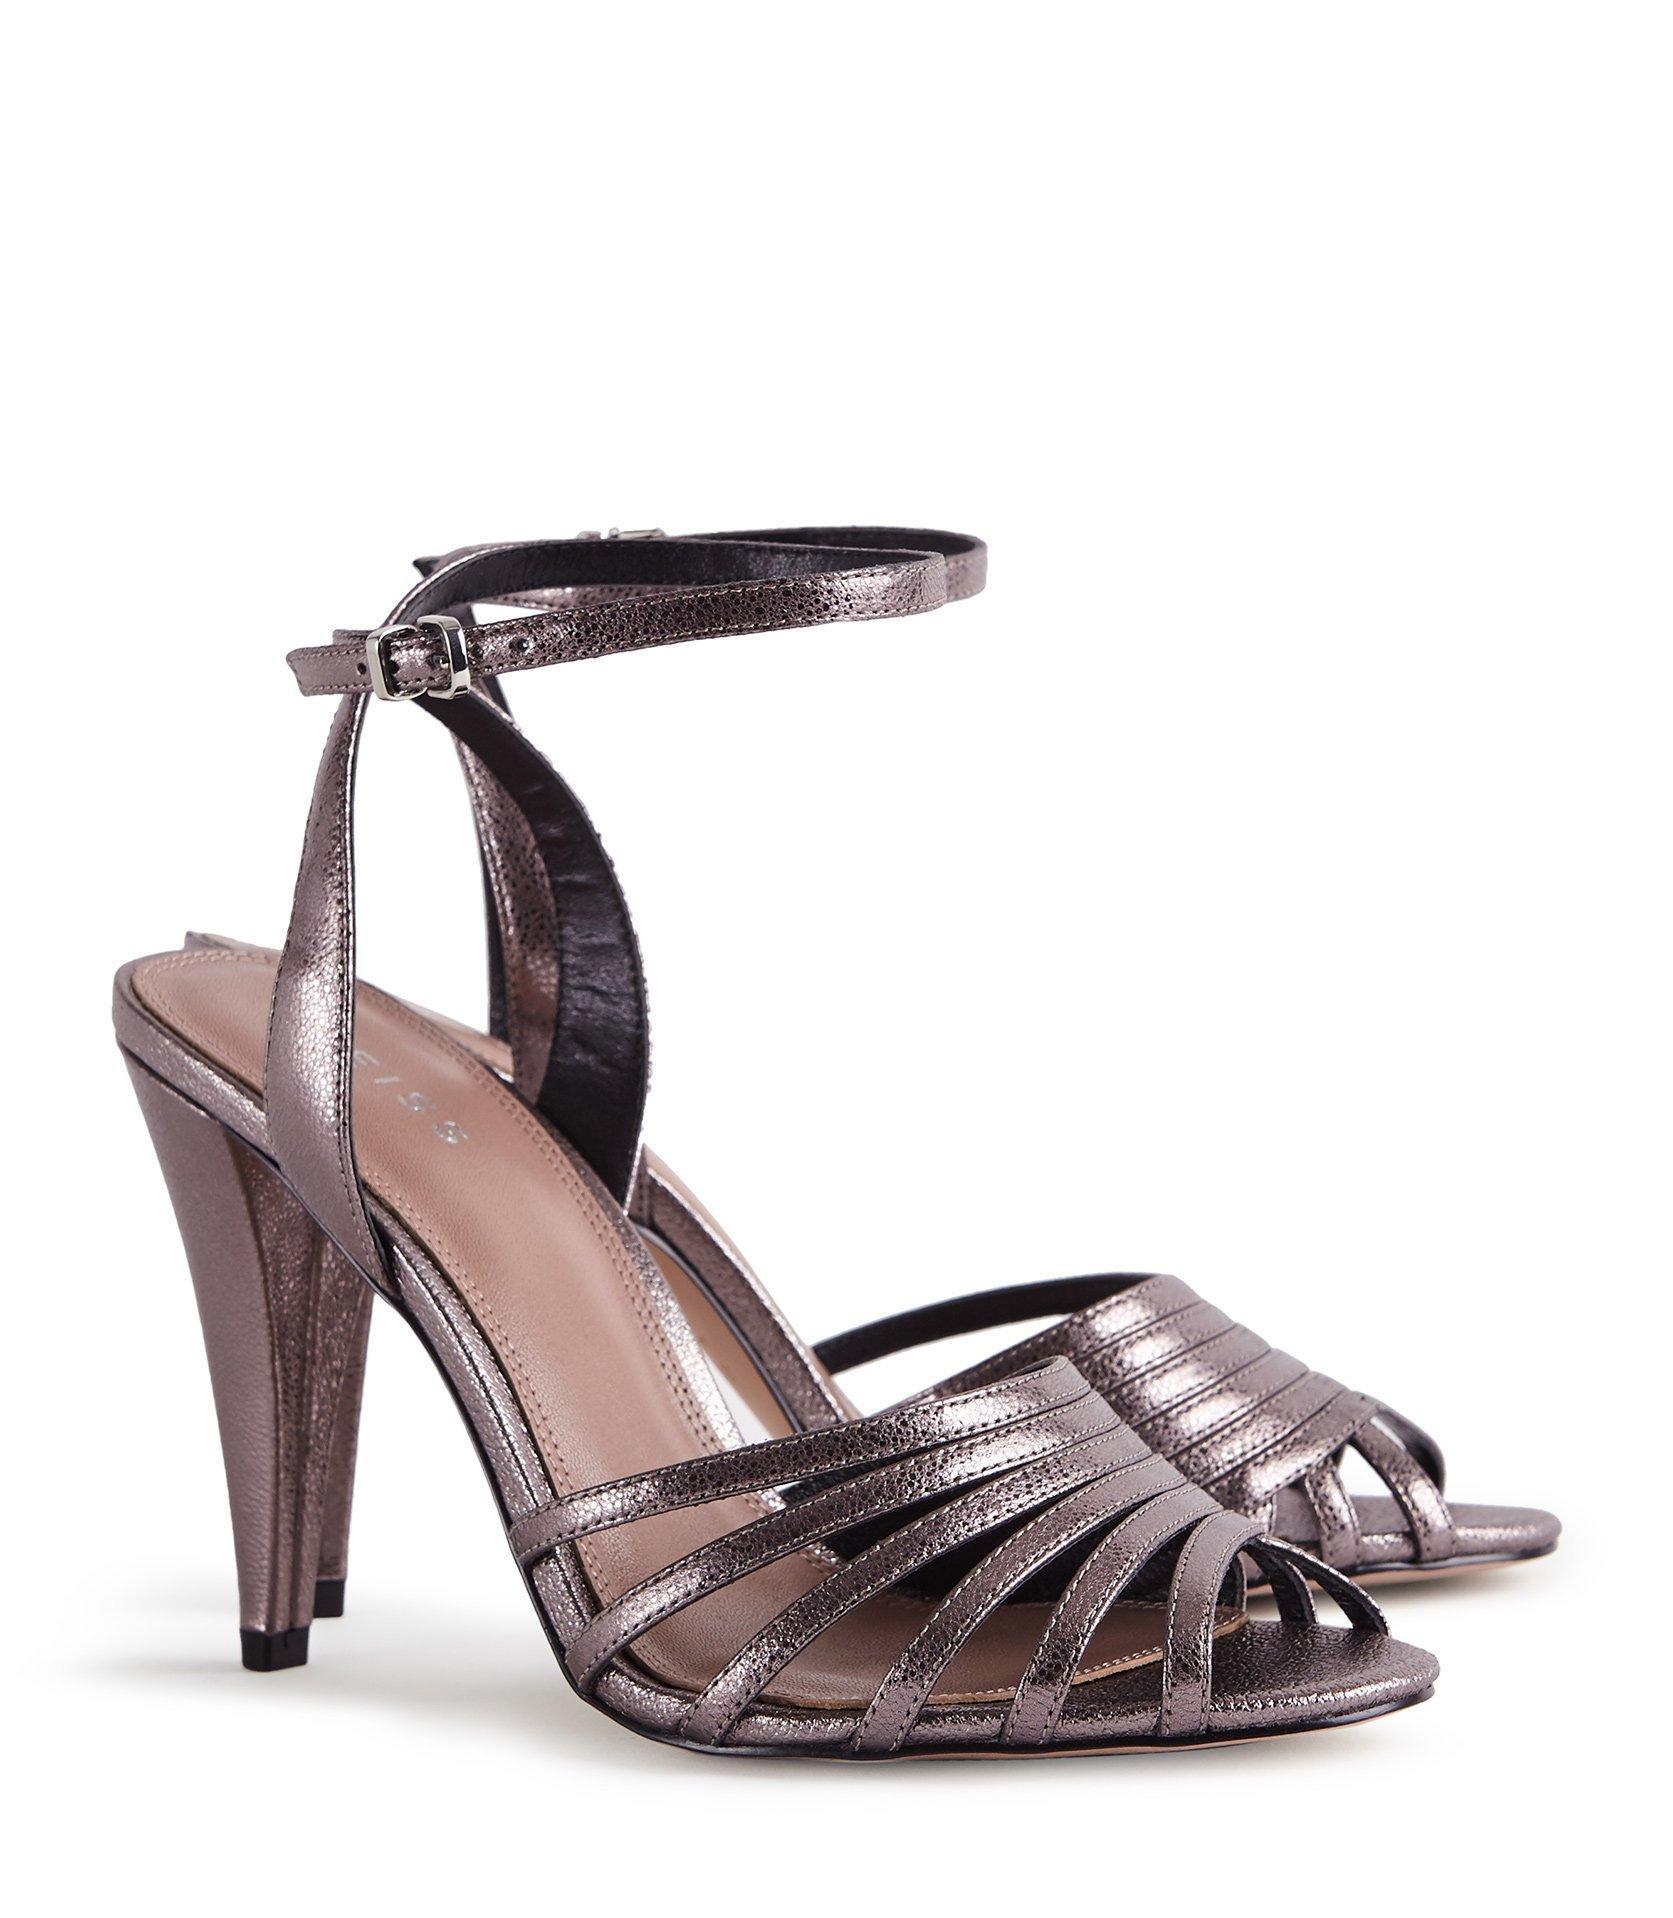 8440f879110285 Reiss - Garbo - Metallic Strappy High Heeled Sandals - Lyst. View fullscreen